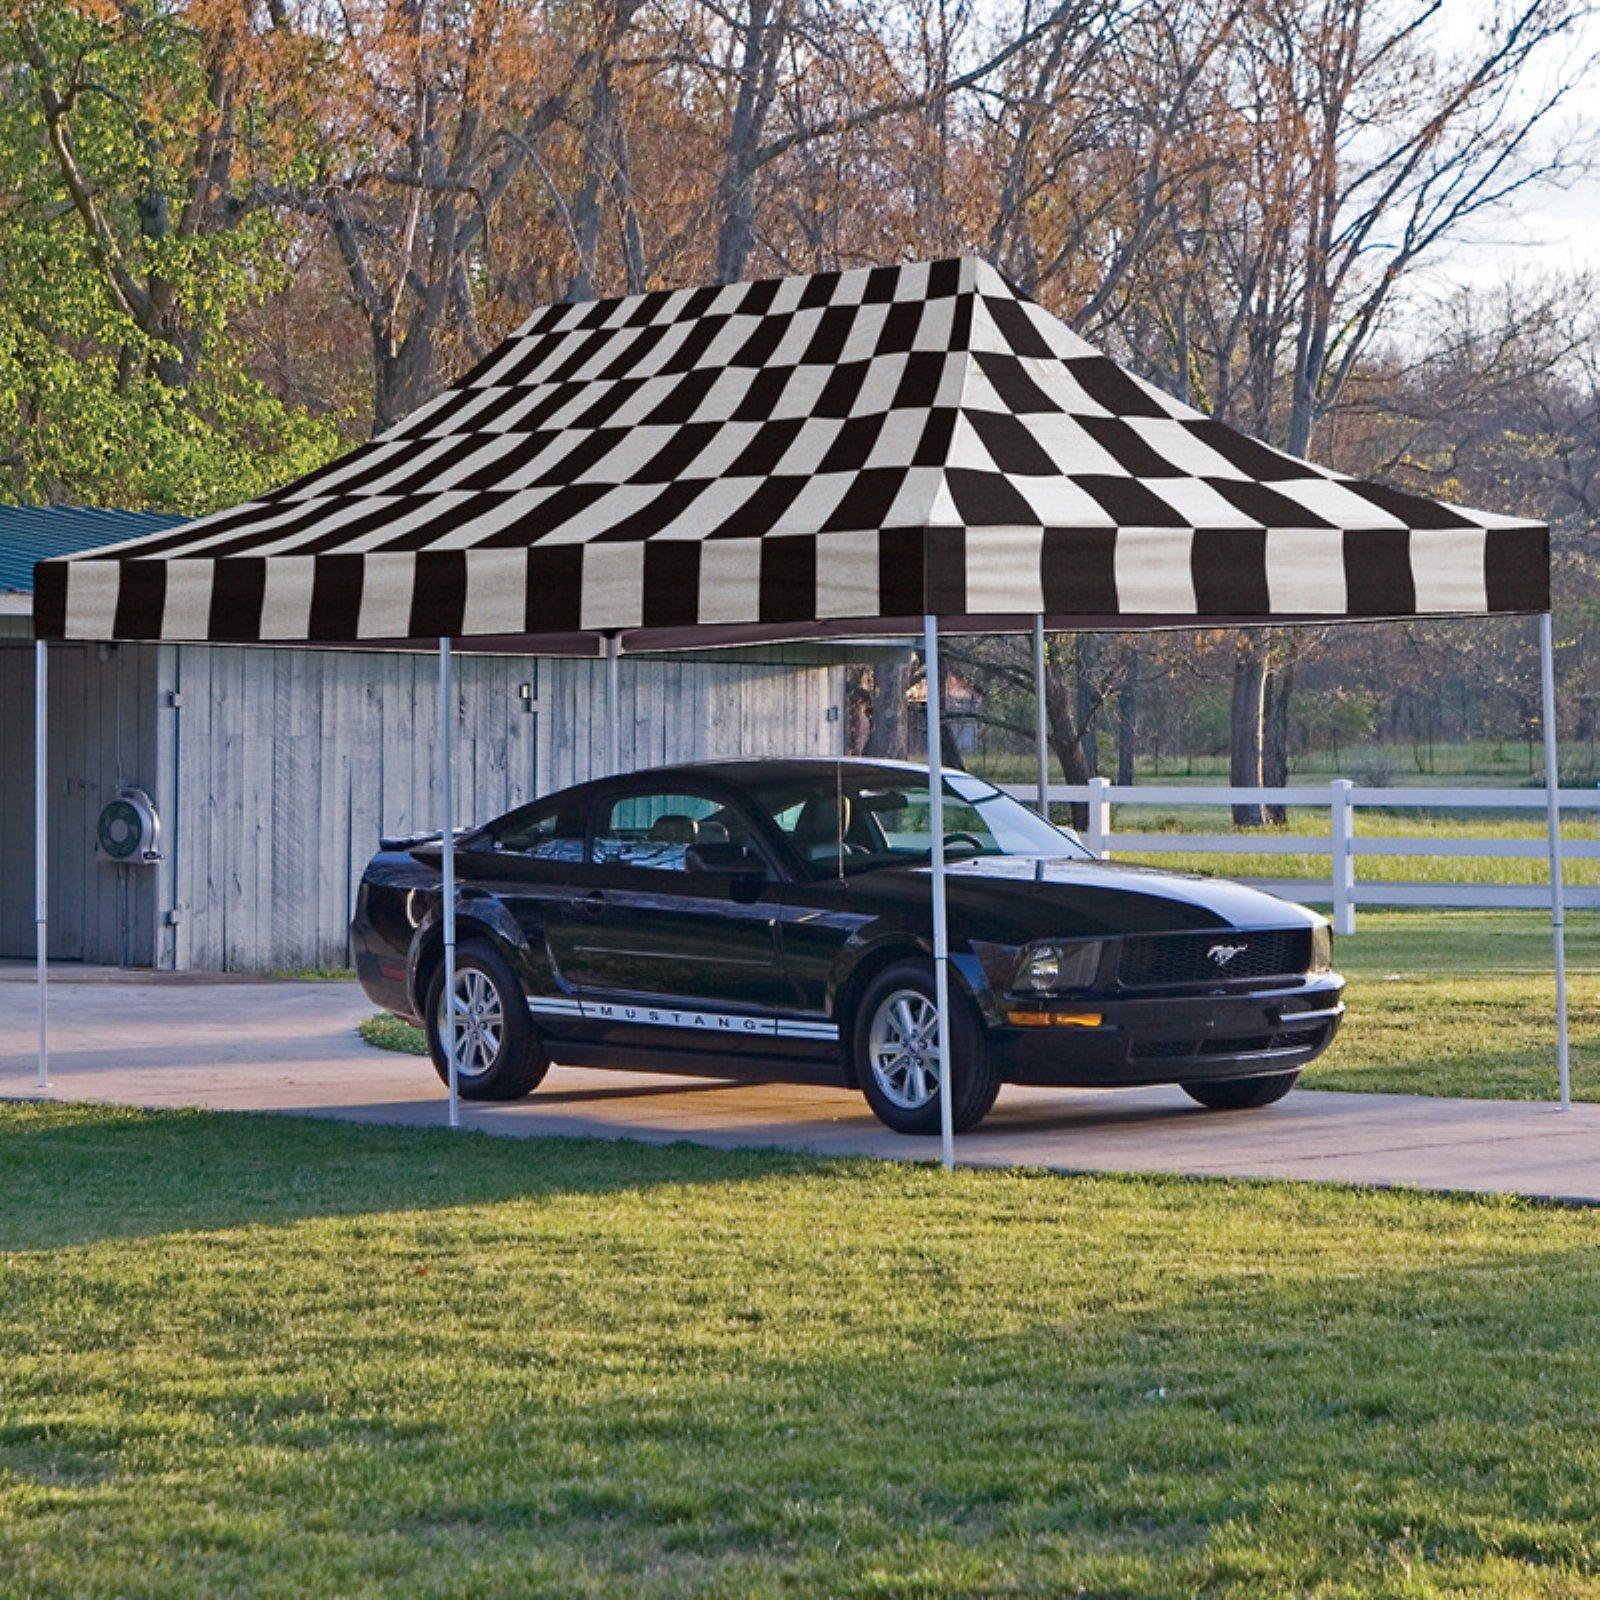 Shelterlogic 10' x 20' Pro Pop-up Canopy Straight Leg, Checkered Flag Cover